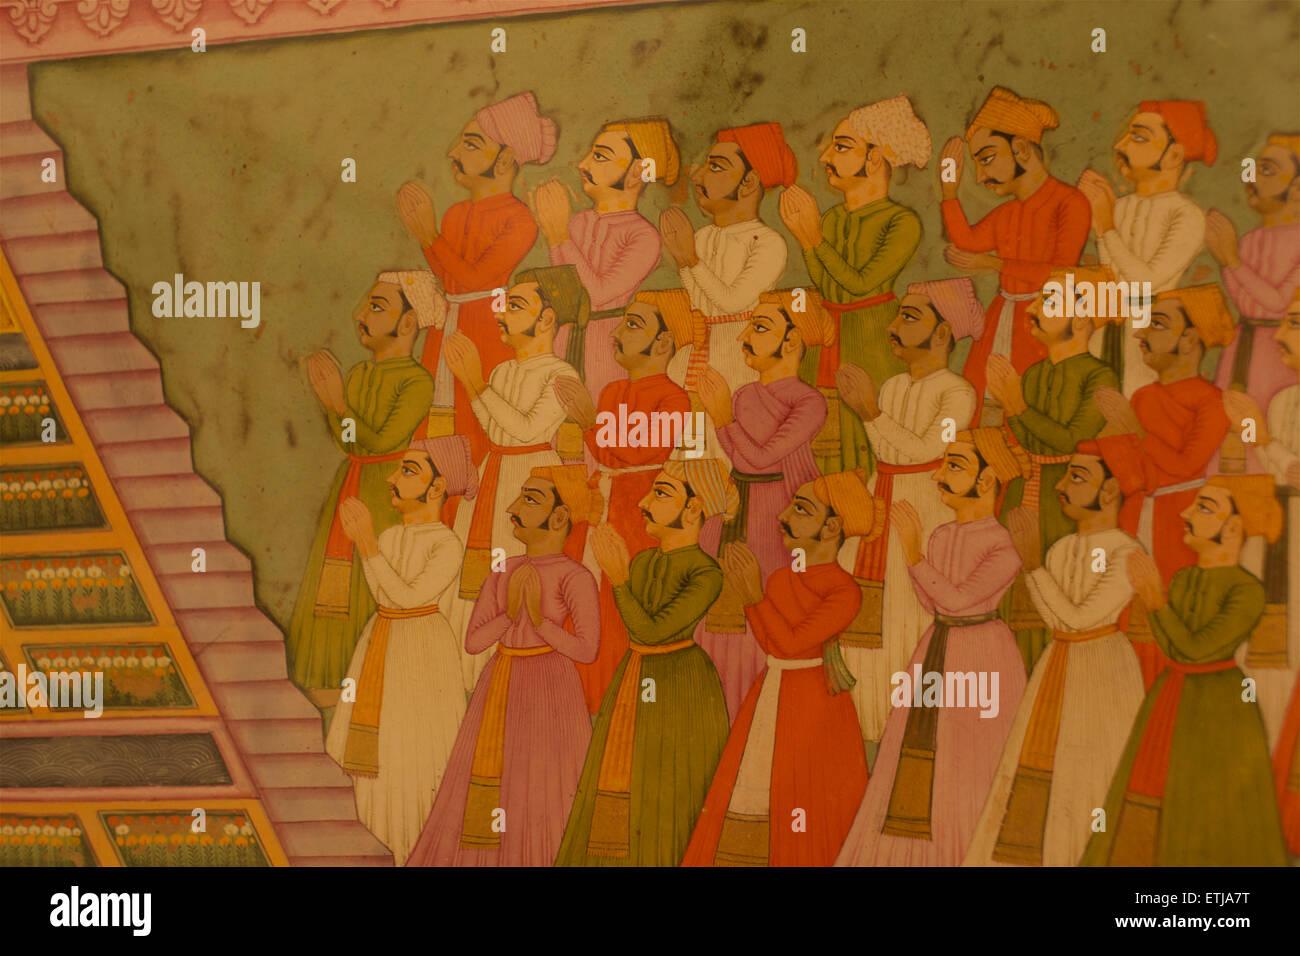 Detail of classical Indian painting Mehrangarh Fort, Jodhpur, Rajasthan, India - Stock Image